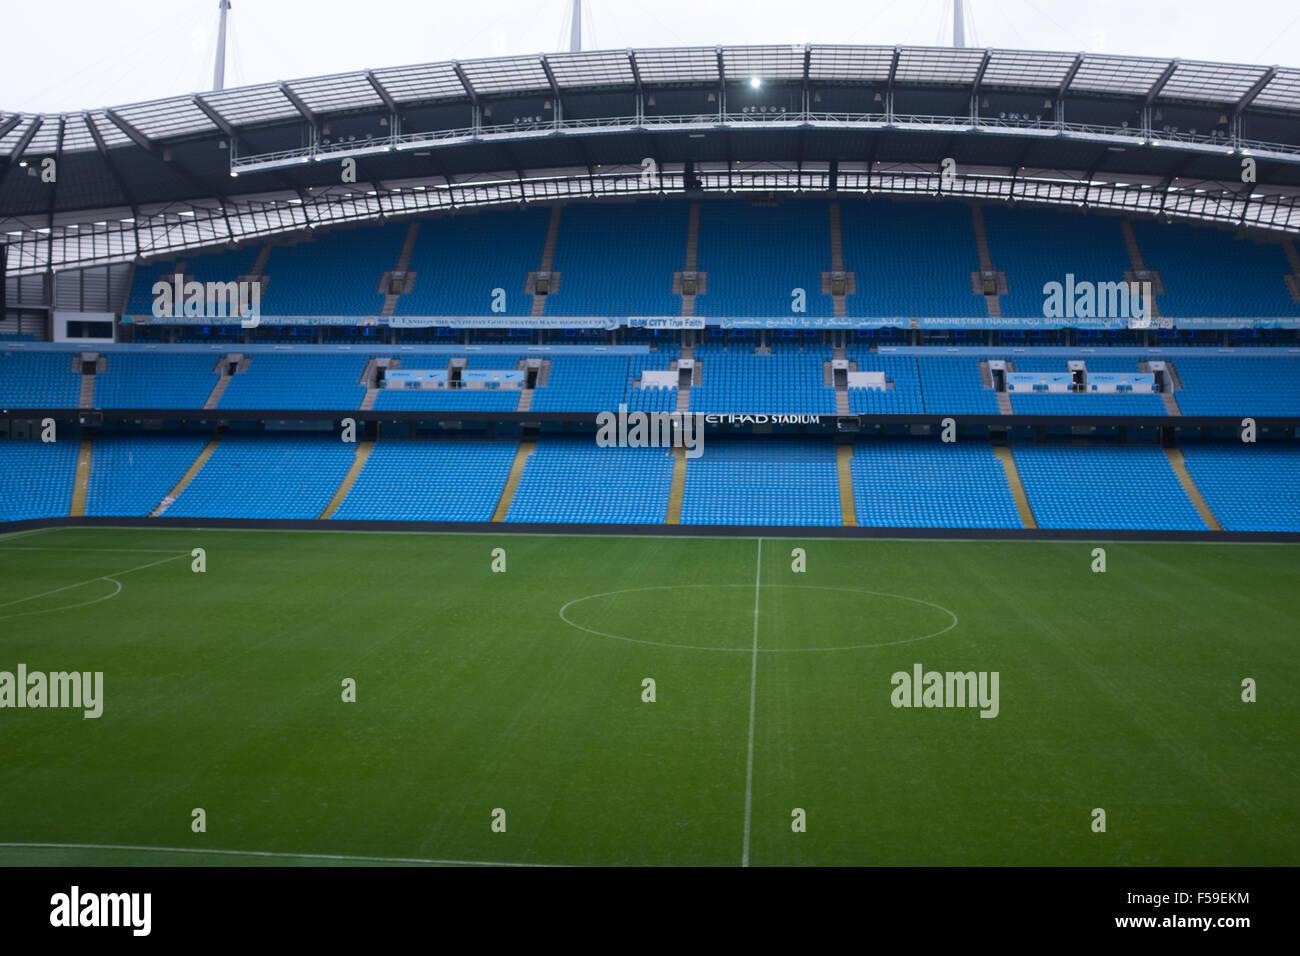 Etihad stadium, Manchester, home of Manchester City FC - Stock Image